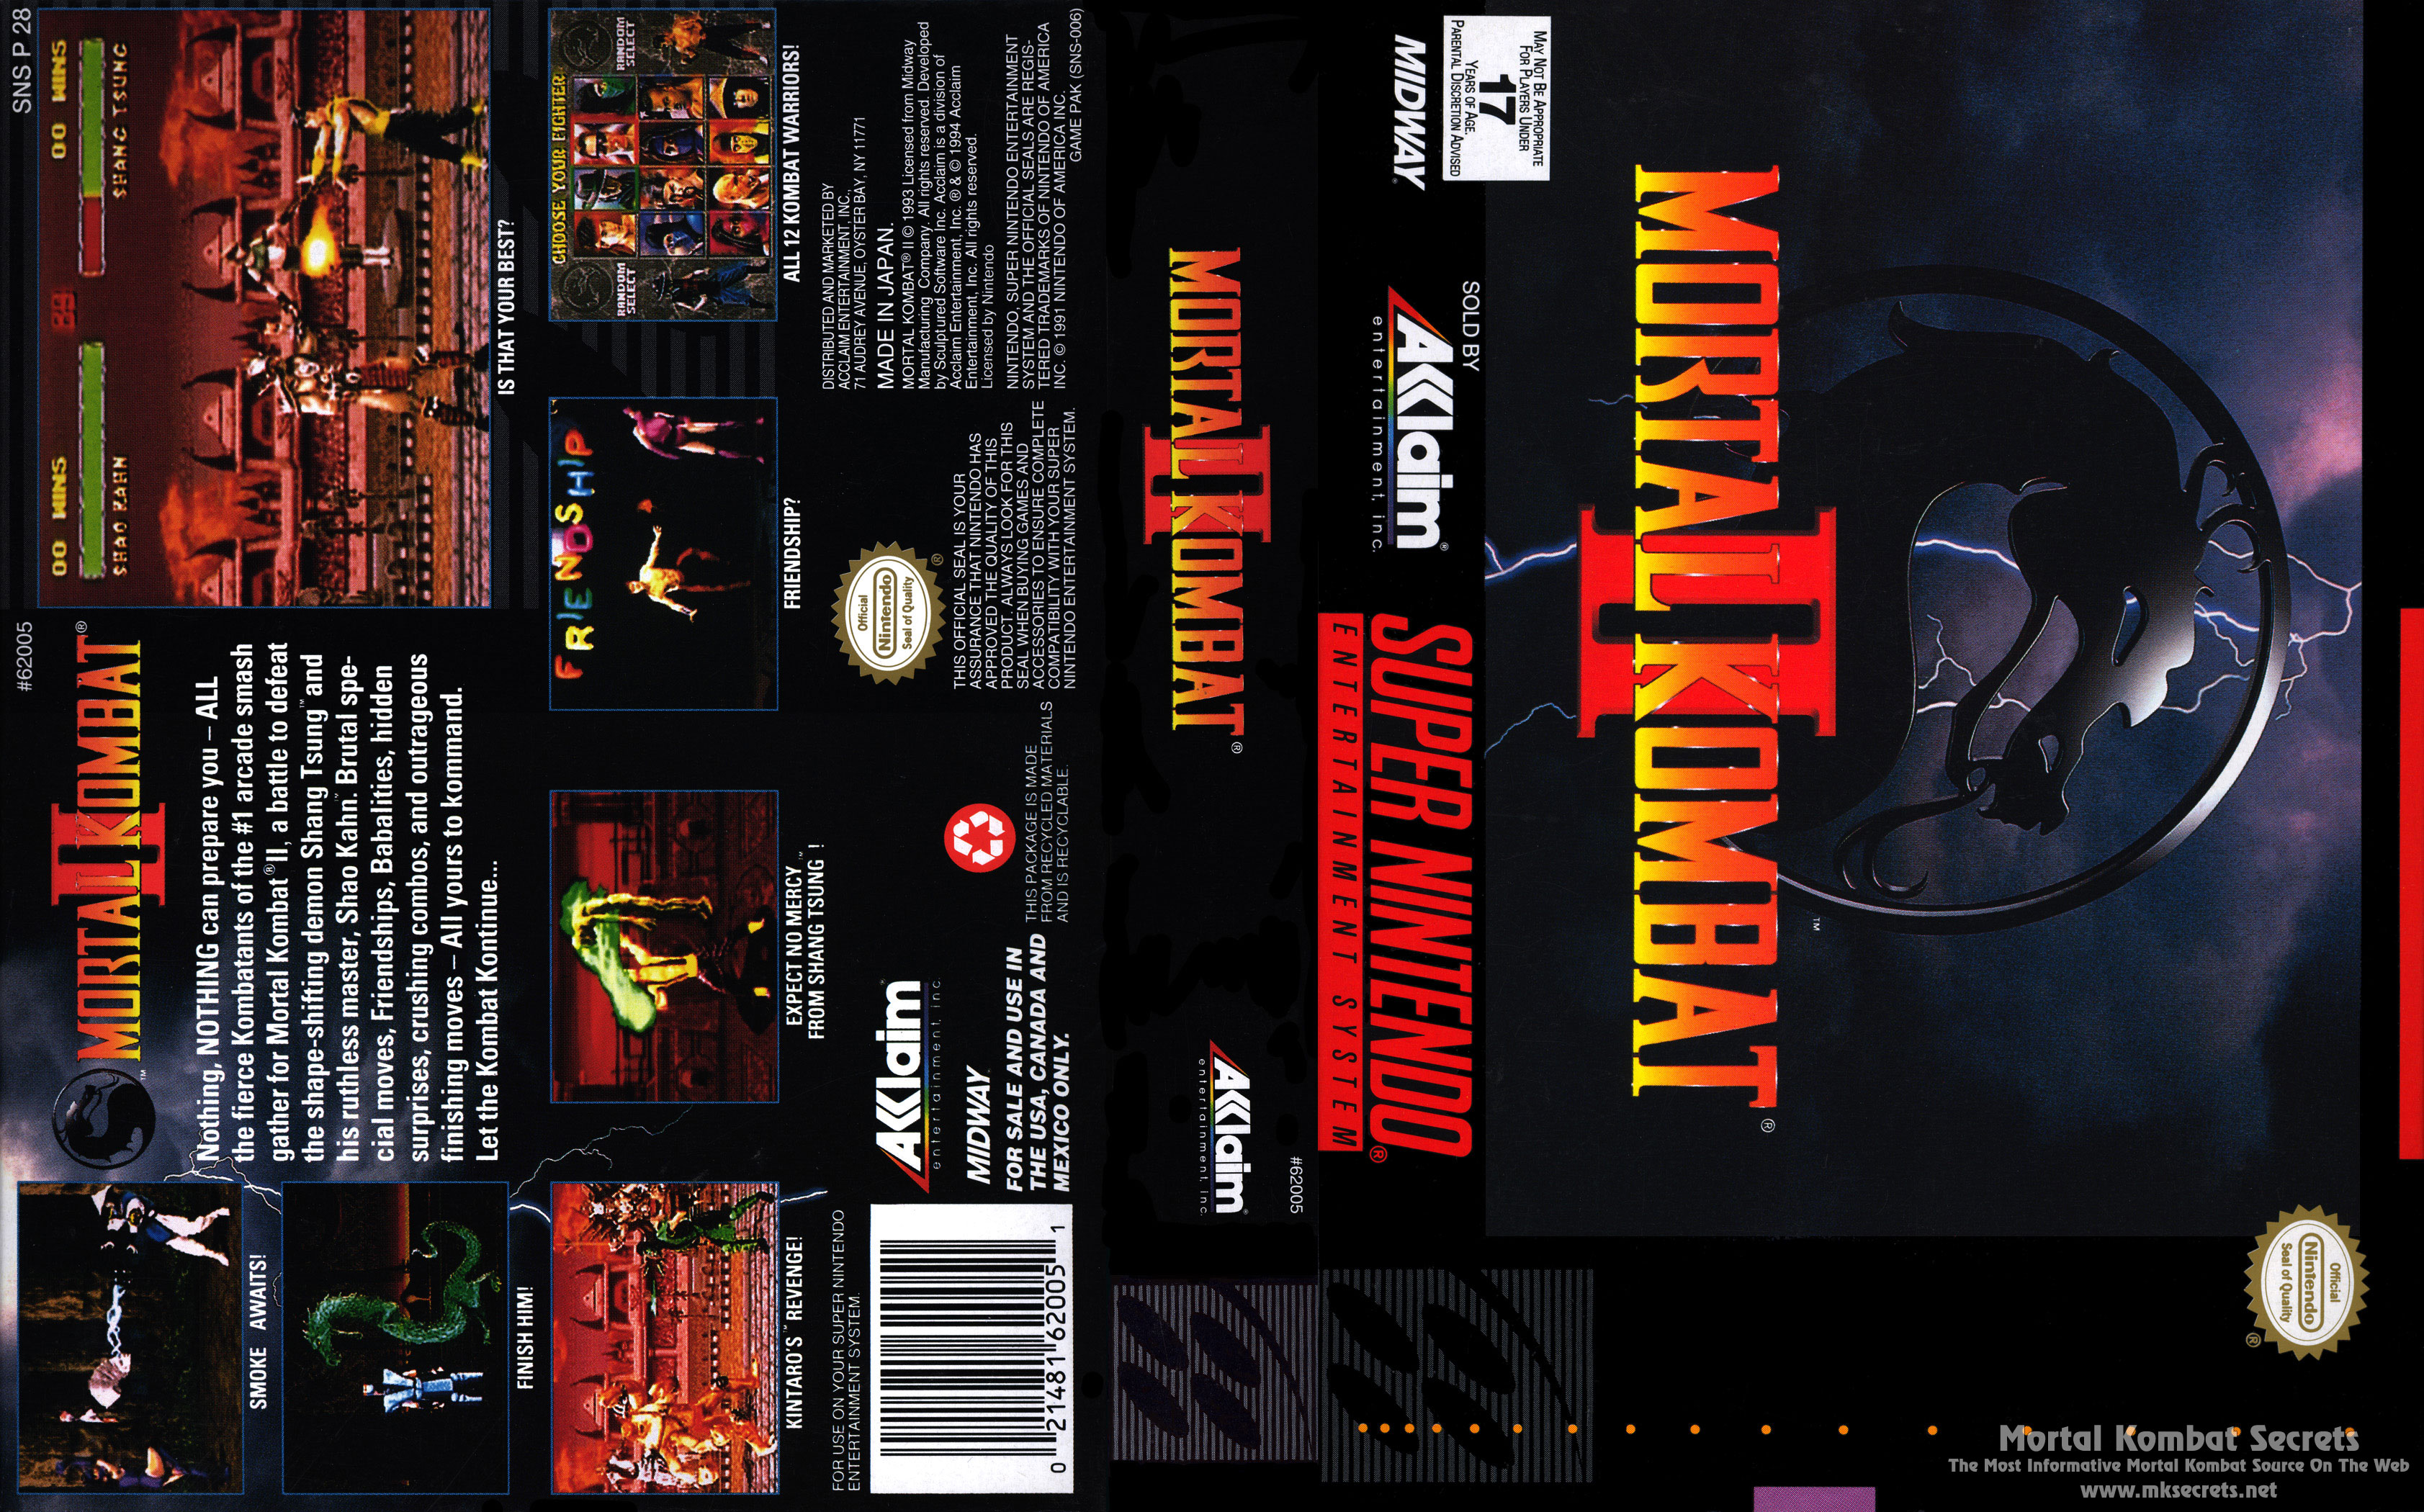 Mortal Kombat Ii Box Art Mortal Kombat Secrets